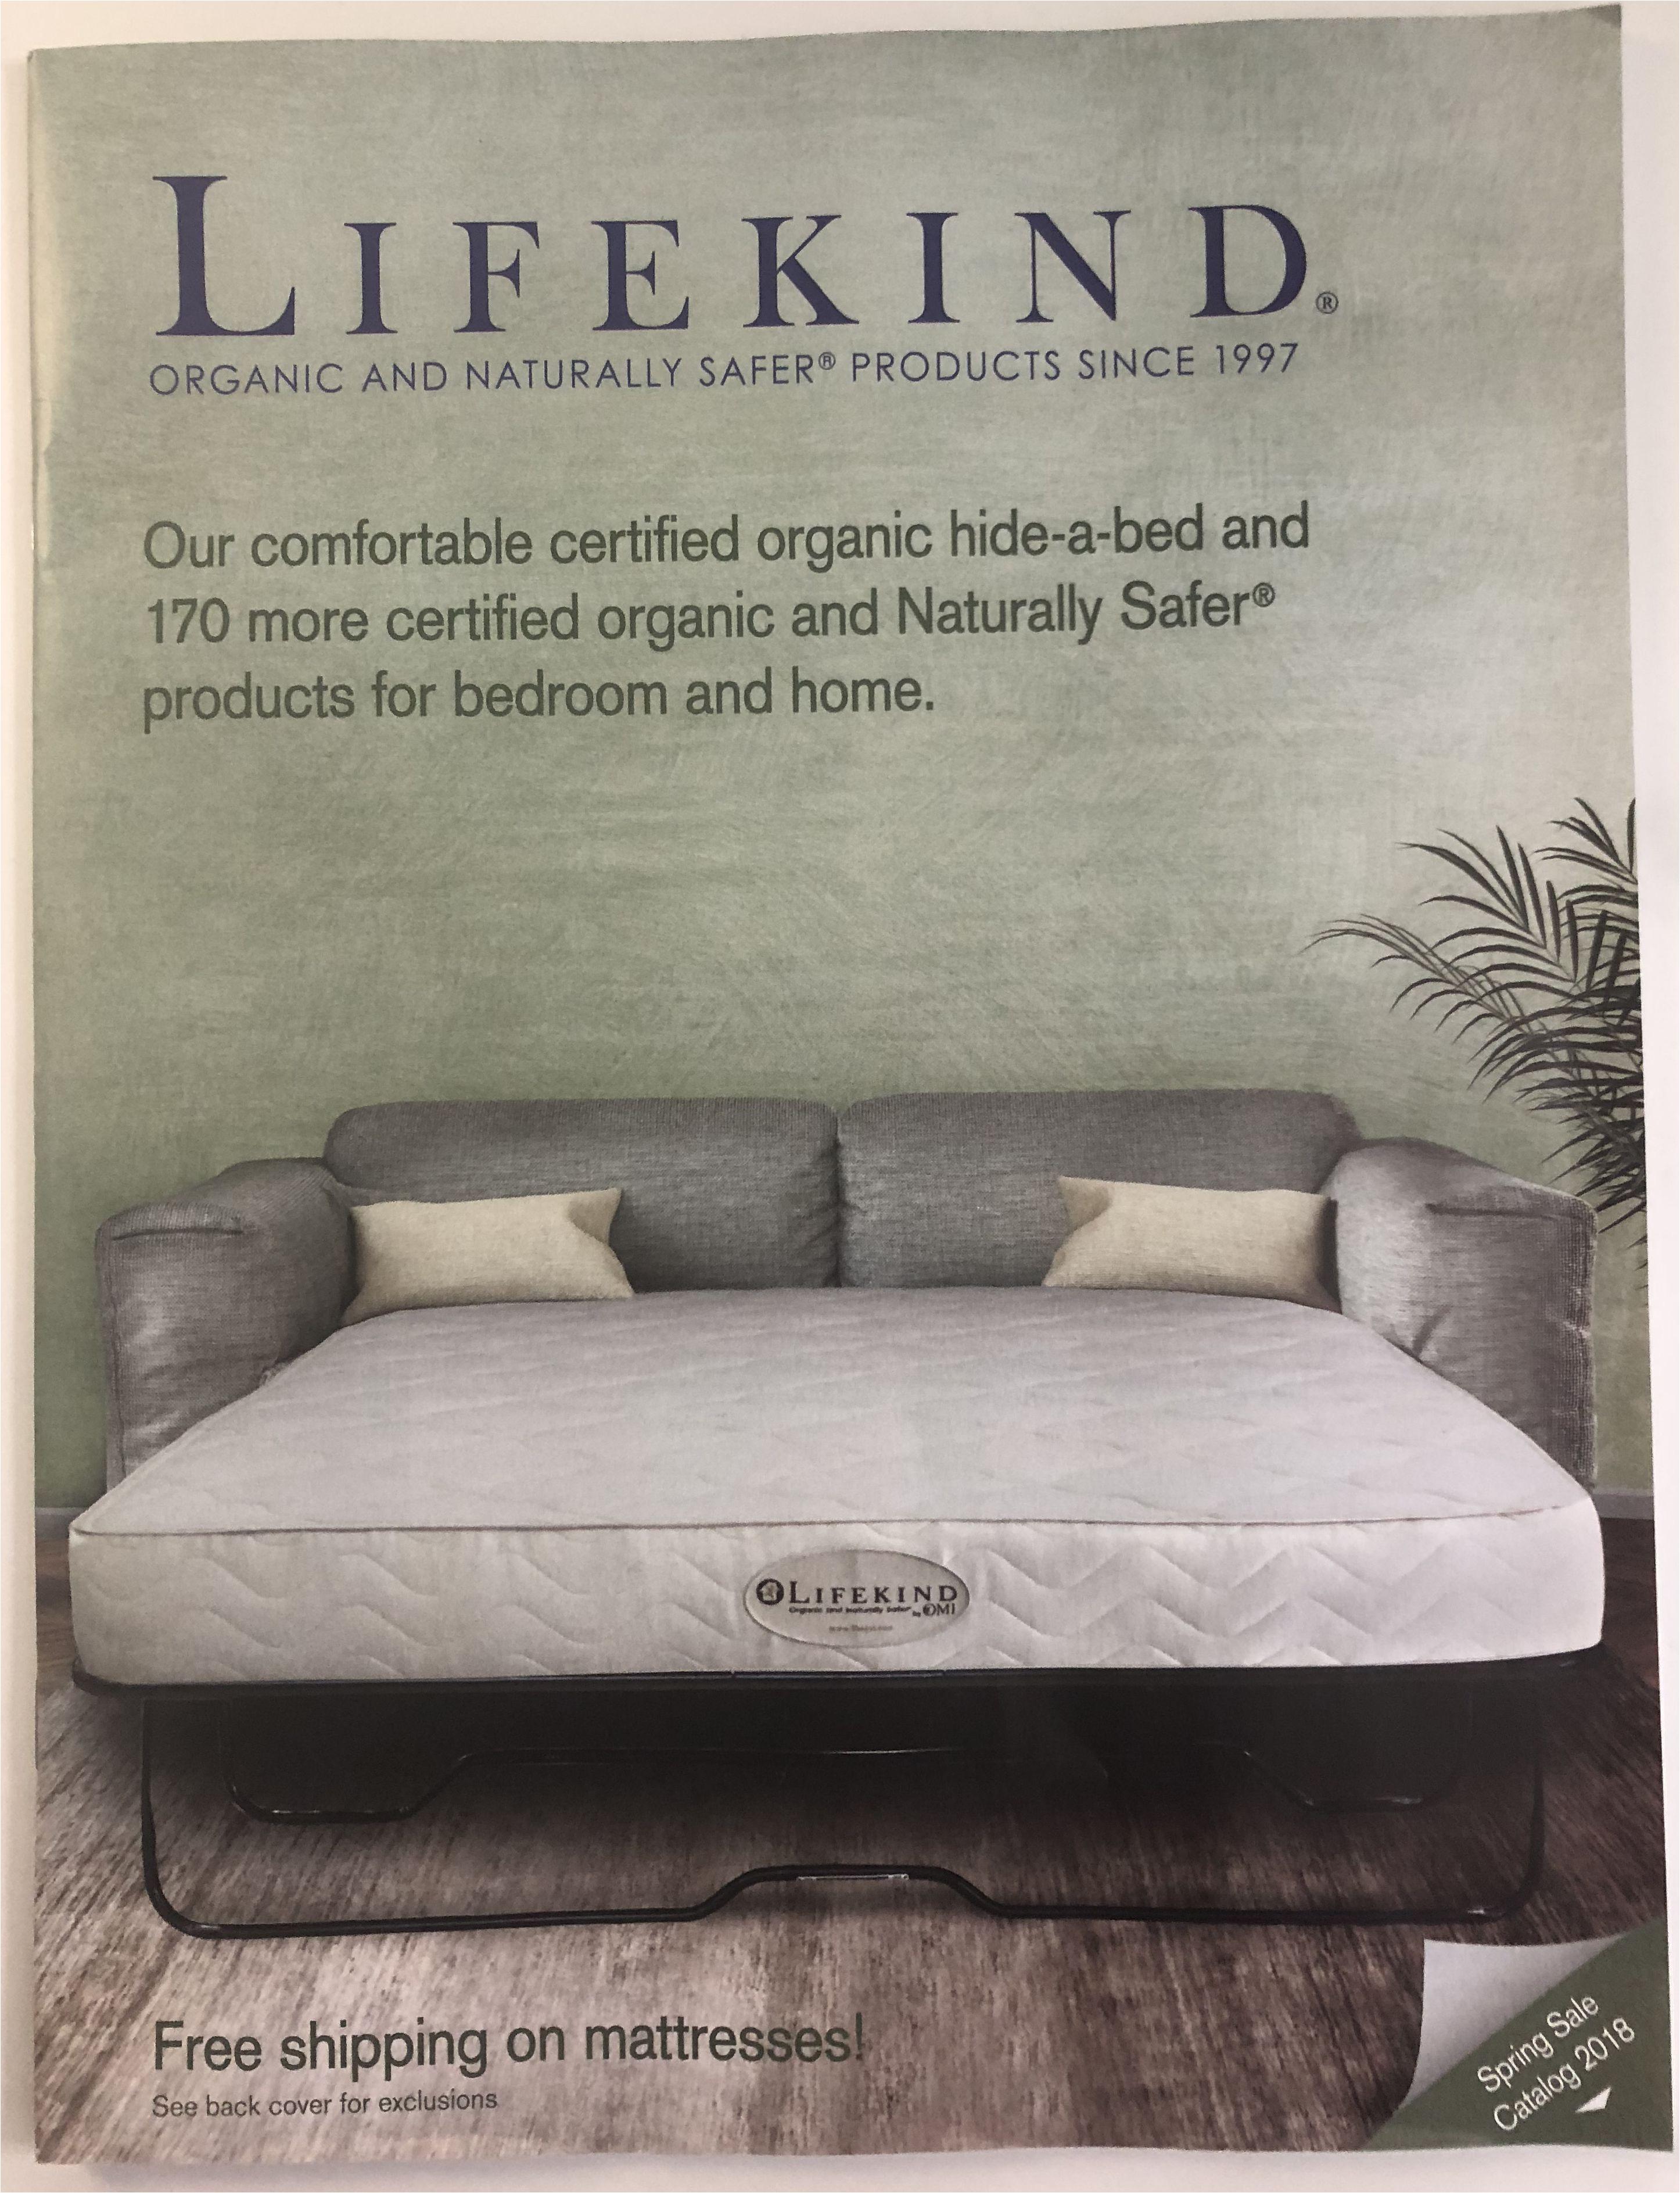 lifekind catalog 5ab53d693037130037c3d007 jpg